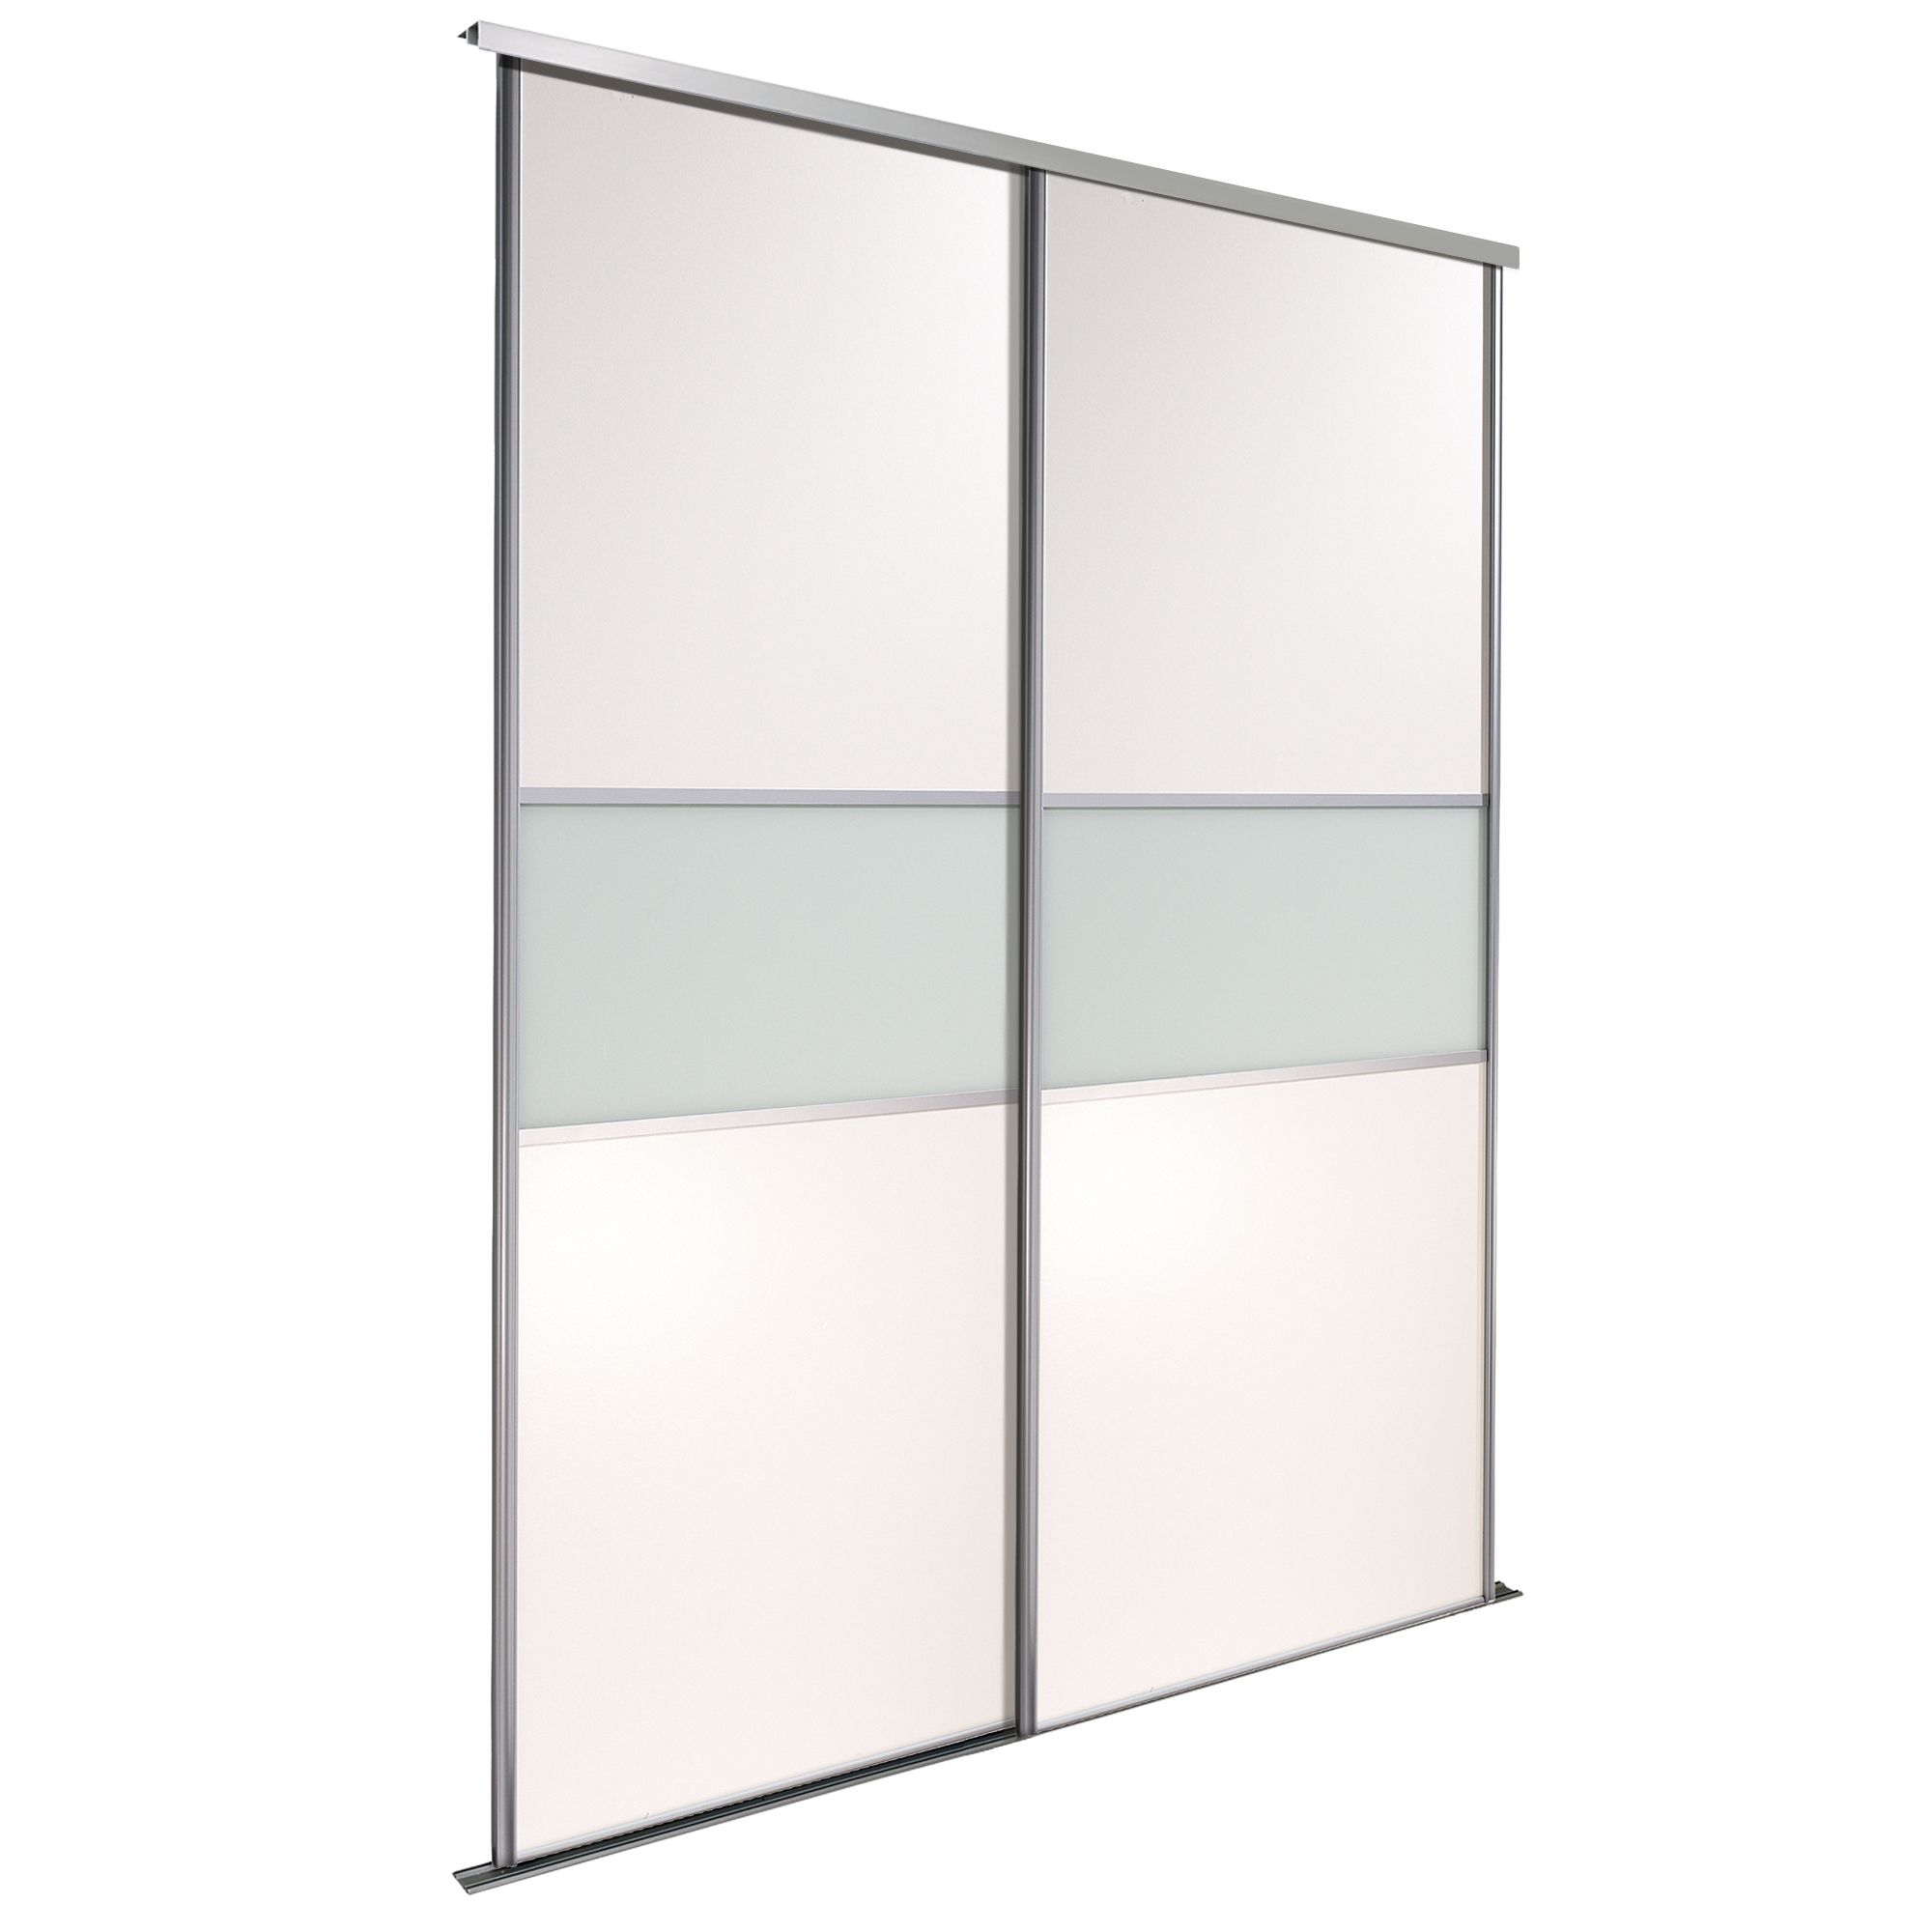 Fineline Silver Glass Panel Effect Sliding Wardrobe Door Kit (h)2200 Mm (w)914 Mm, Pack Of 2